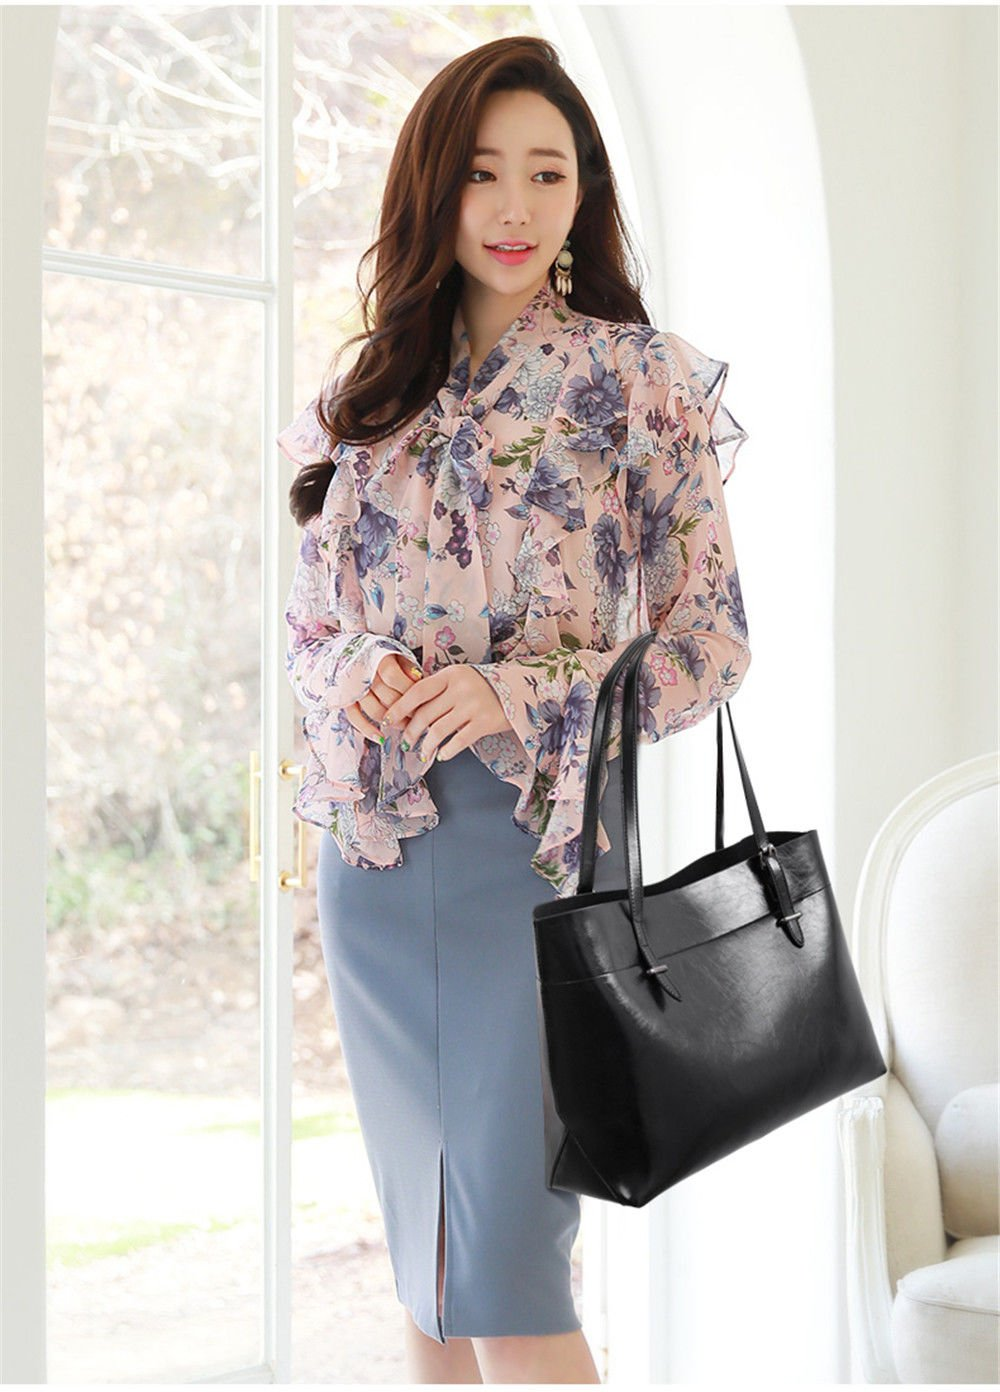 Mother Bag Fashion Back To Ancient Large Capacity Single Shoulder Bag,Black,Three Piece Set by SJMMBB (Image #1)